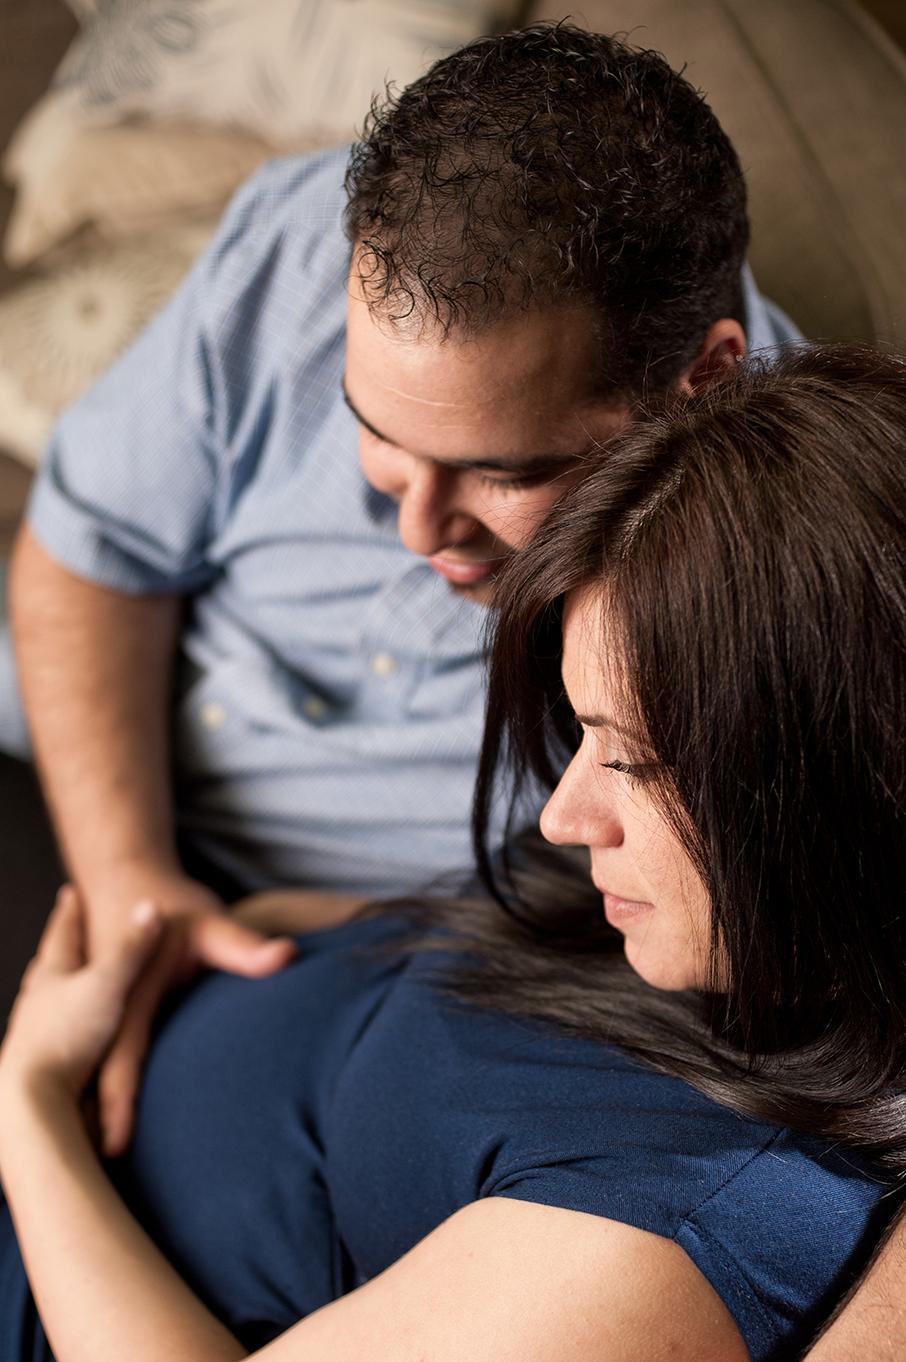 Christina&Rui_Maternity-1.jpg